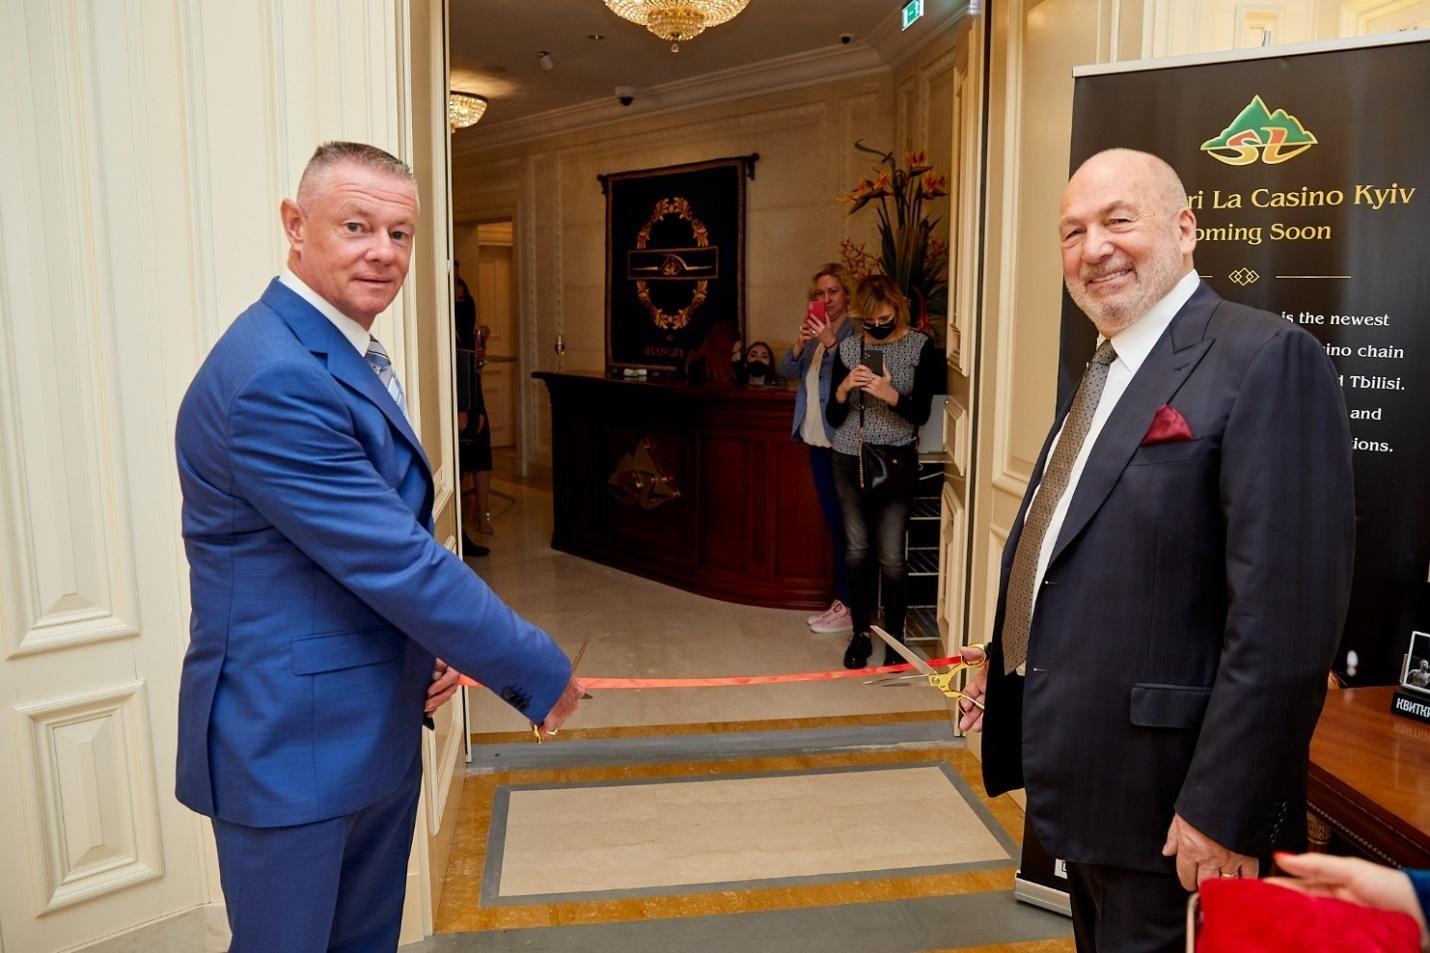 Shangri La International Casino Has Opened at The Fairmont Grand Hotel in Kyiv